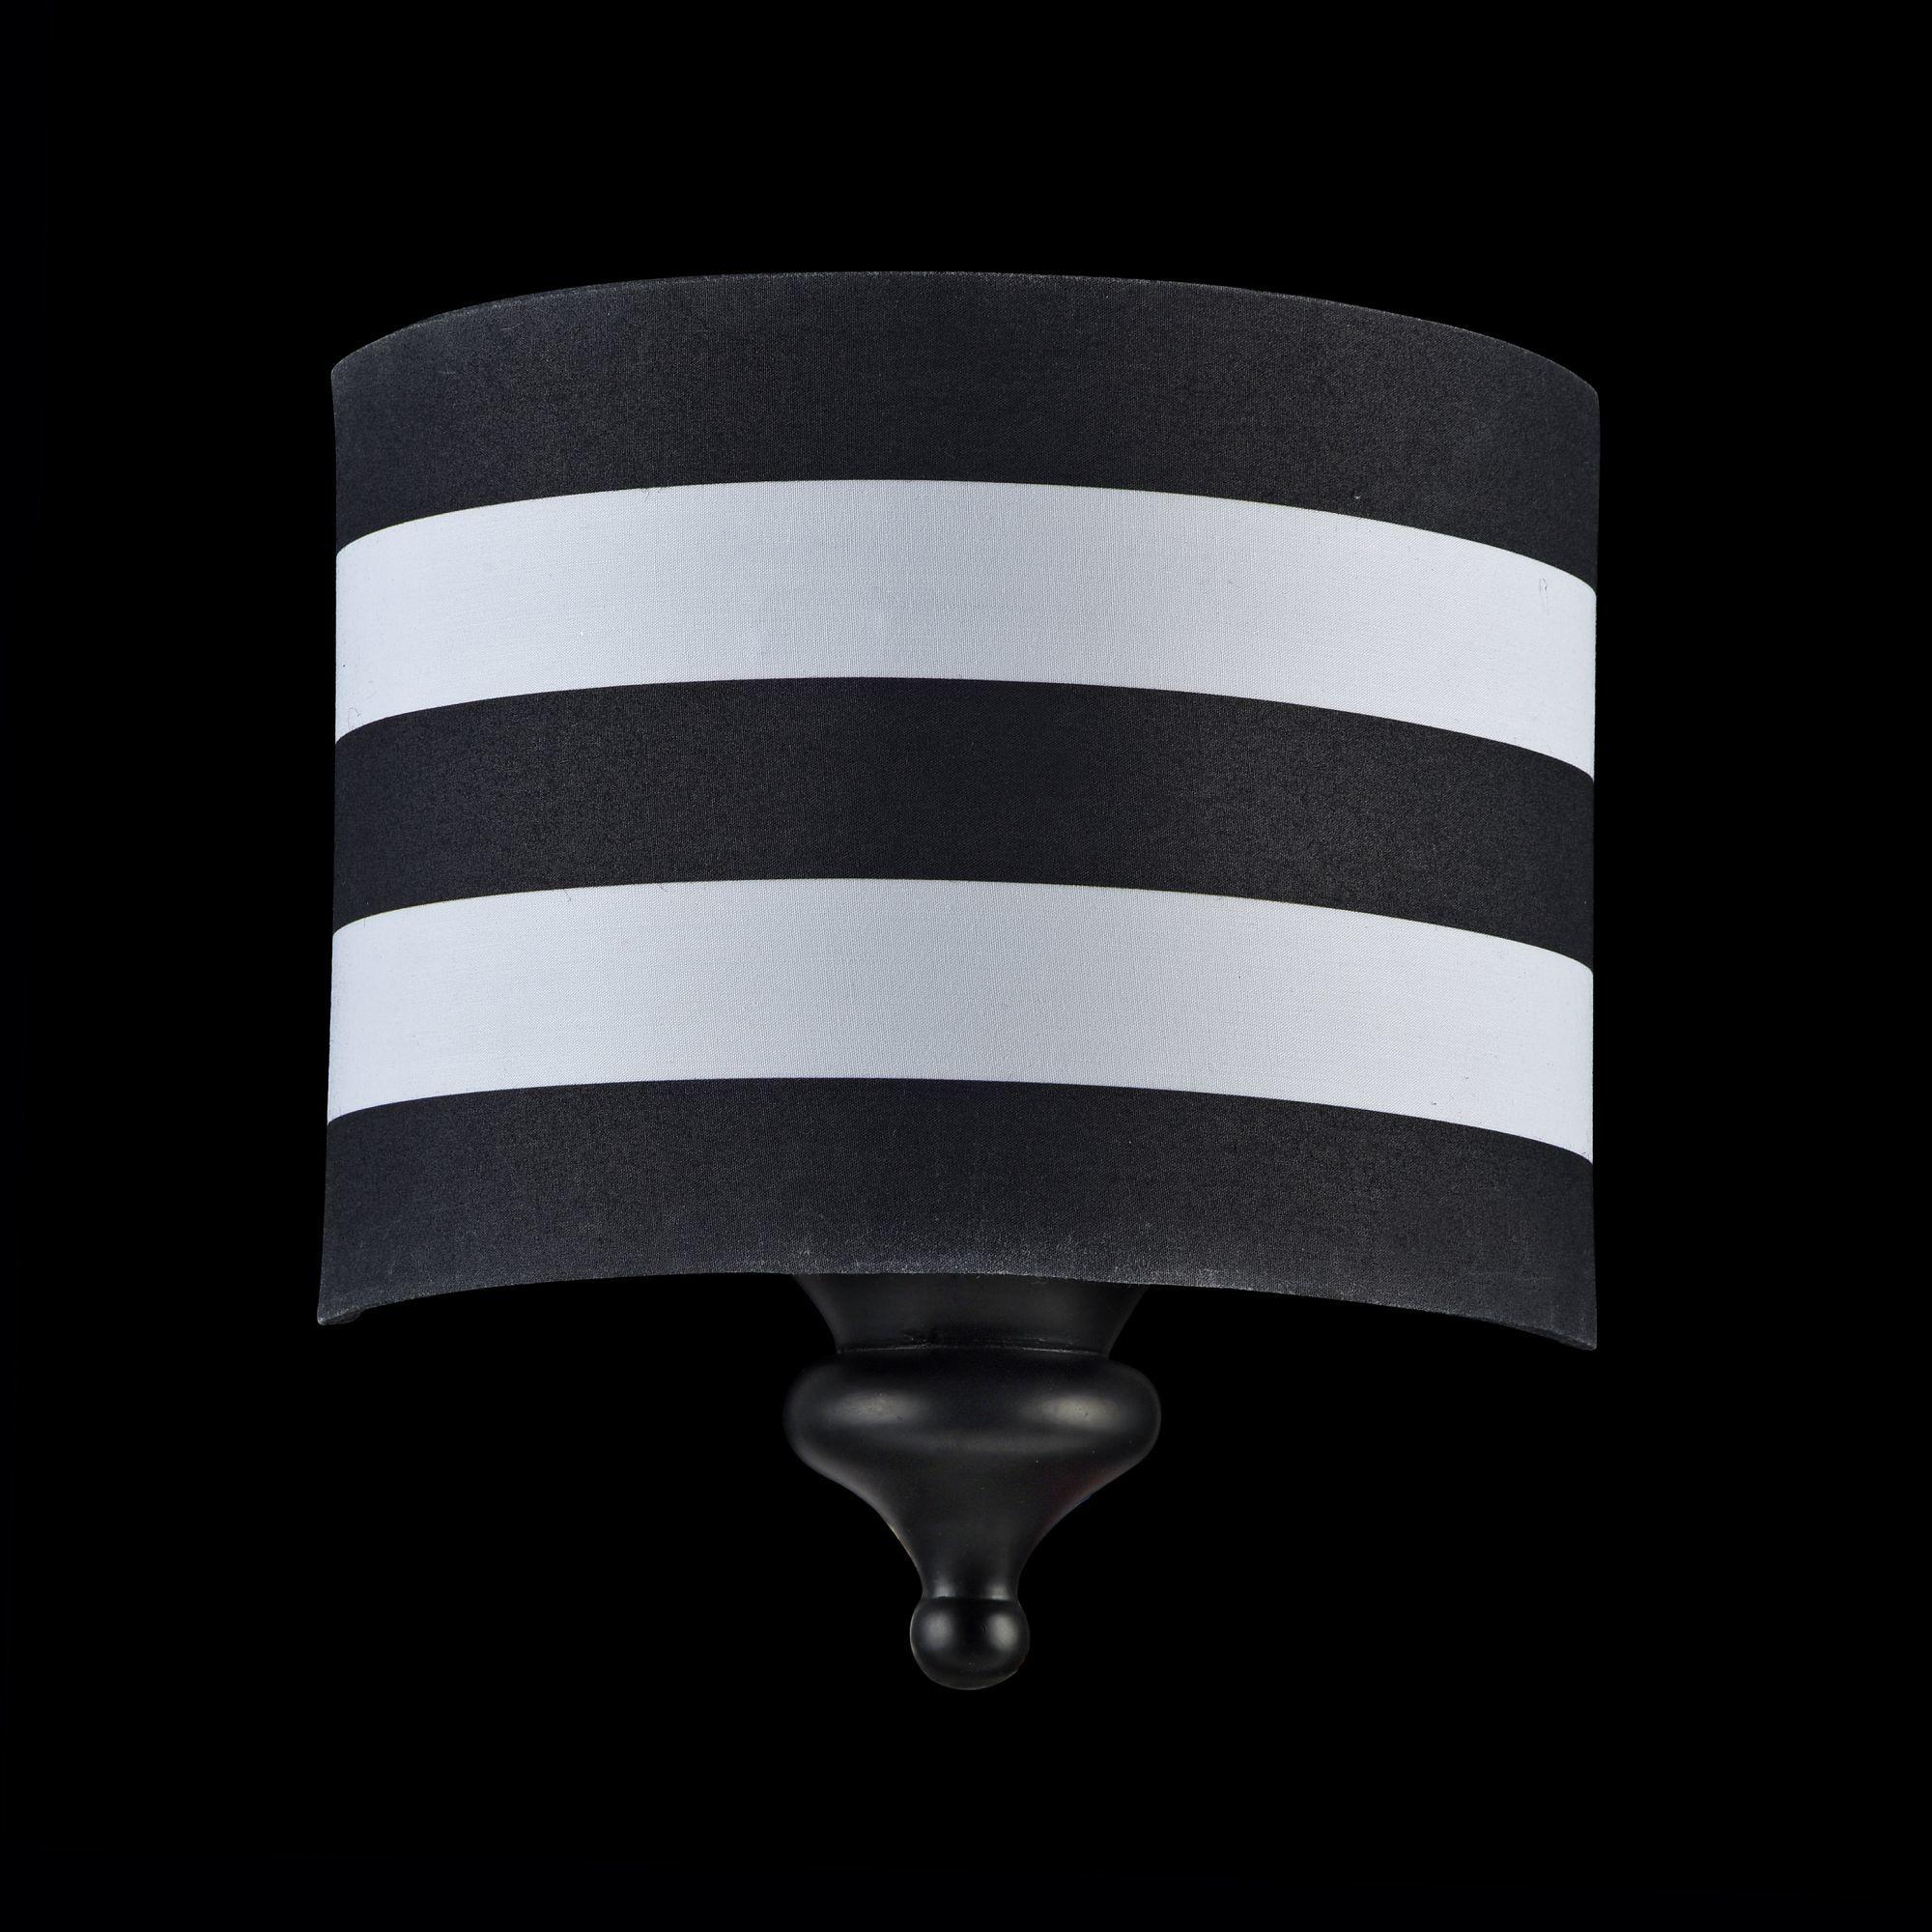 Бра Maytoni Sailor MOD963-WL-01-B, 1xE14x40W, черный, черно-белый, металл, текстиль - фото 3